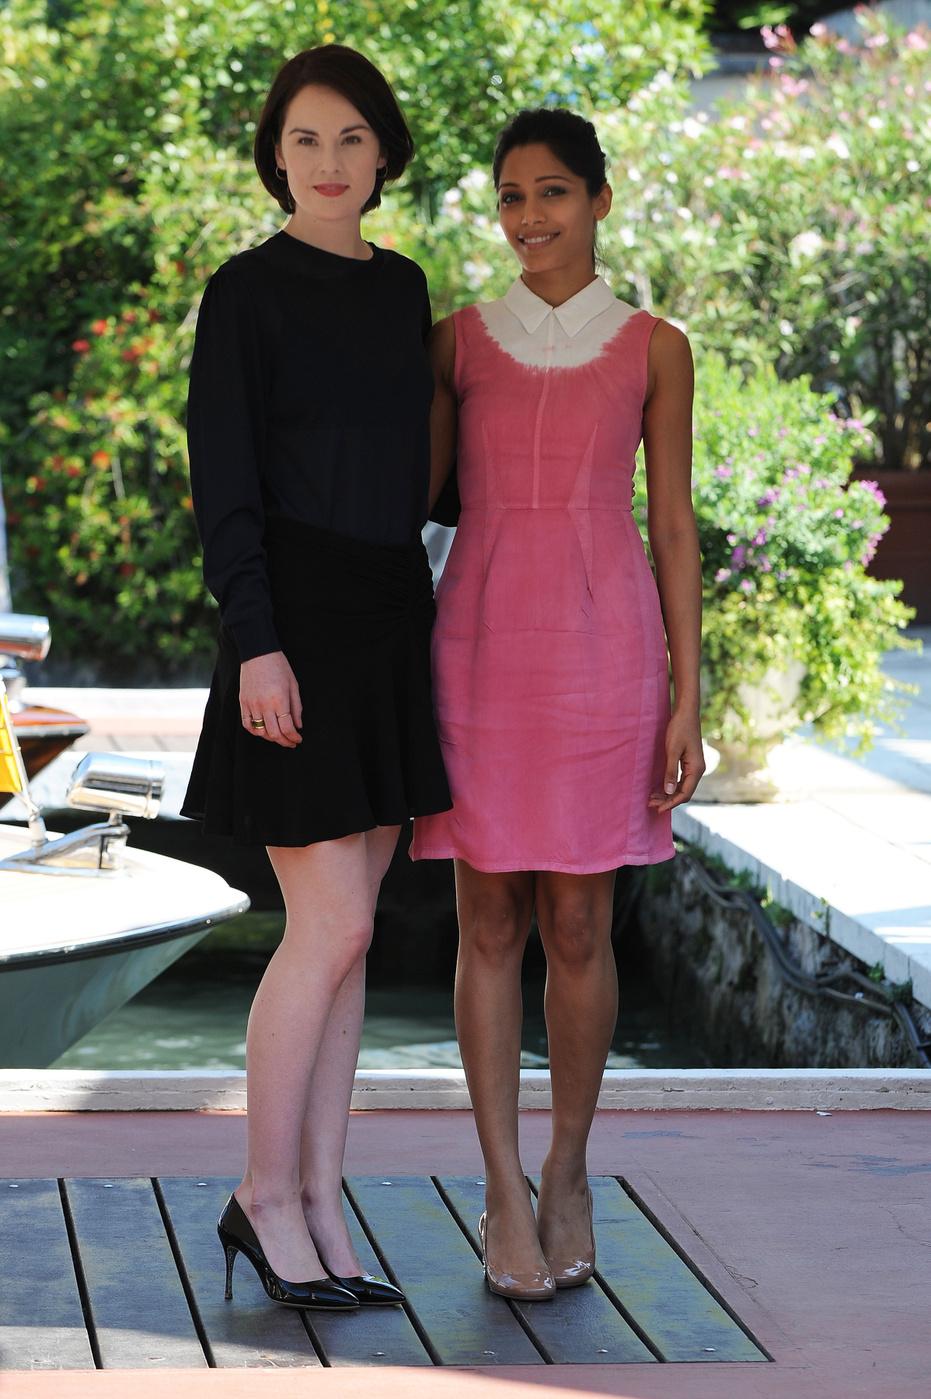 Venice Film Festival Fug or Fab: Michelle Dockery and Freida Pinto